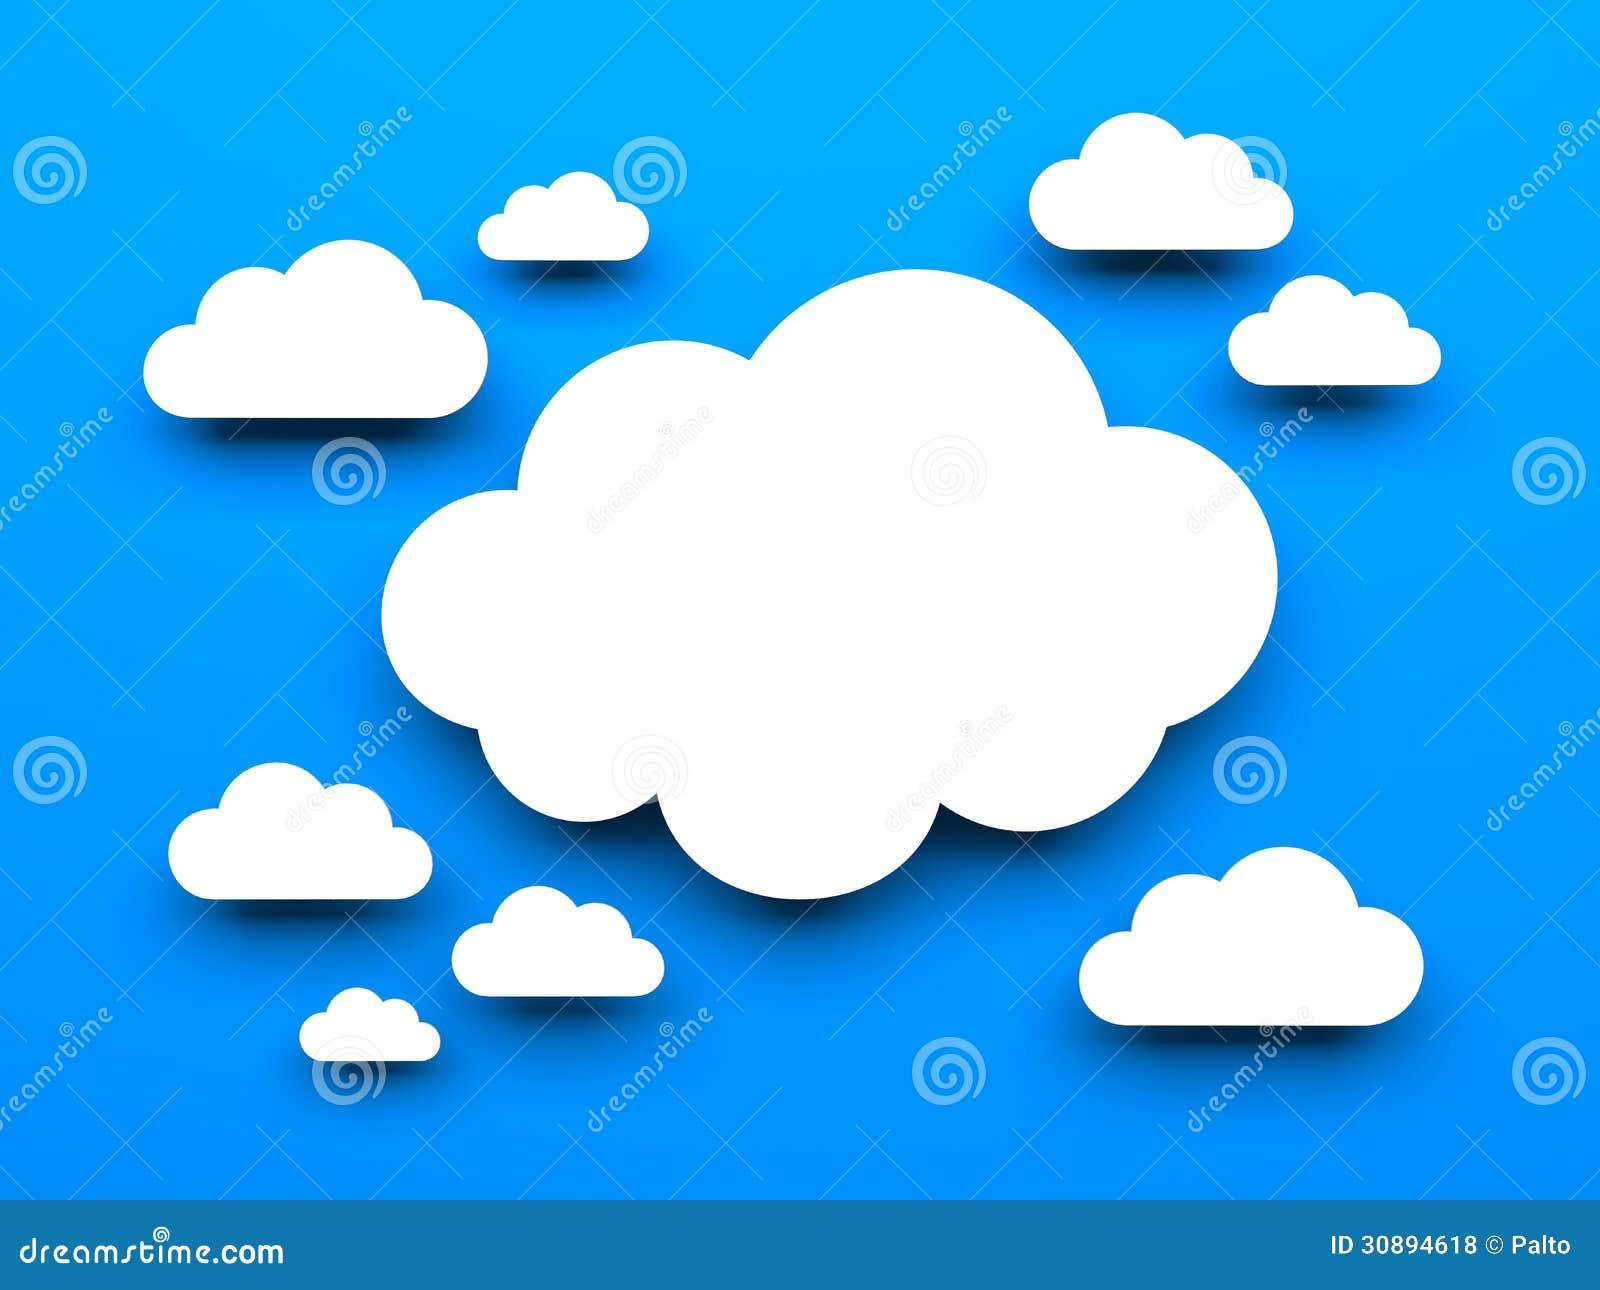 Royalty Free Stock S Cloud Metaphor